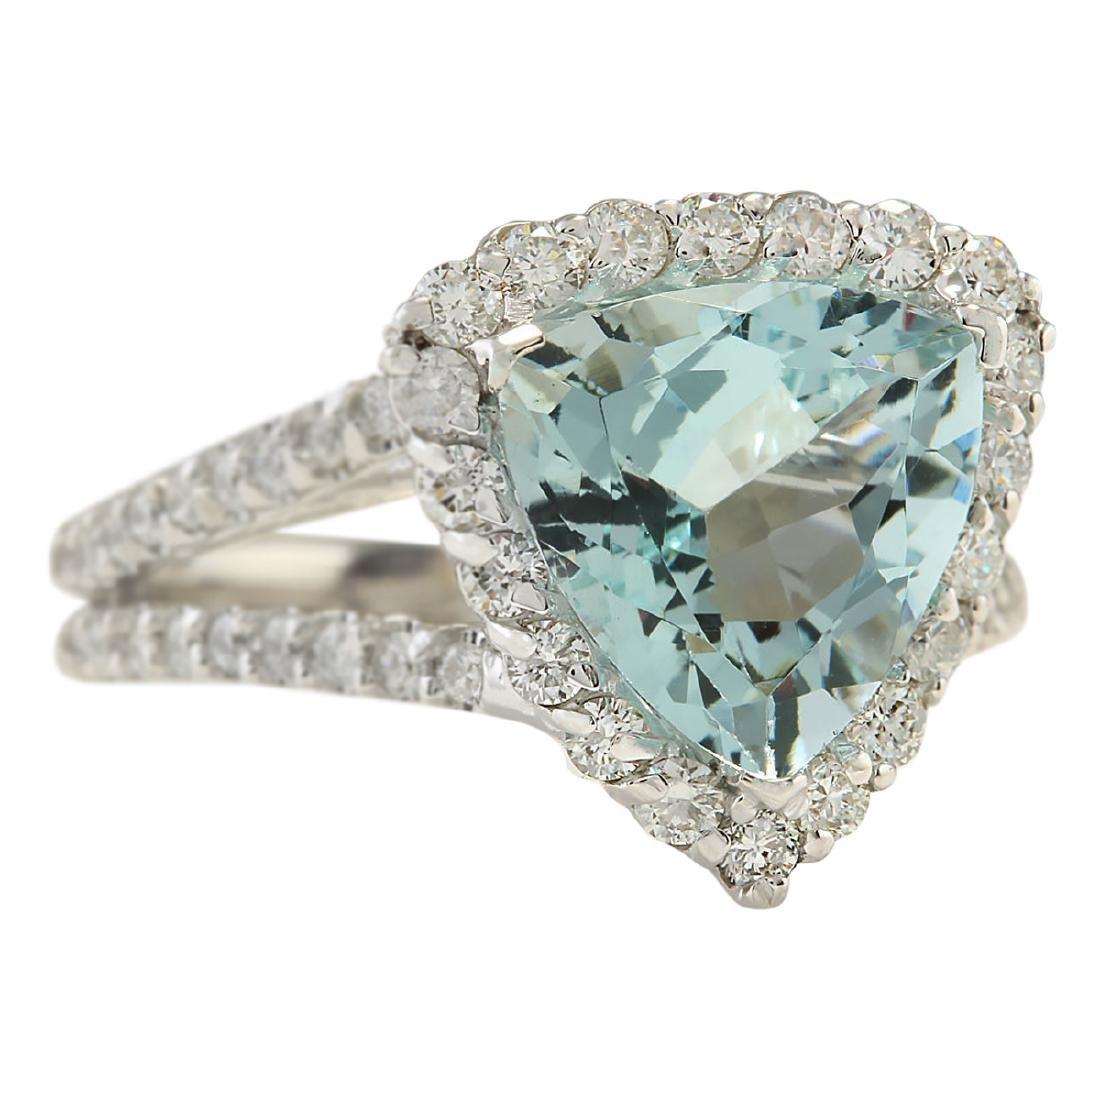 3.52 CTW Natural Aquamarine And Diamond Ring In 18K - 2